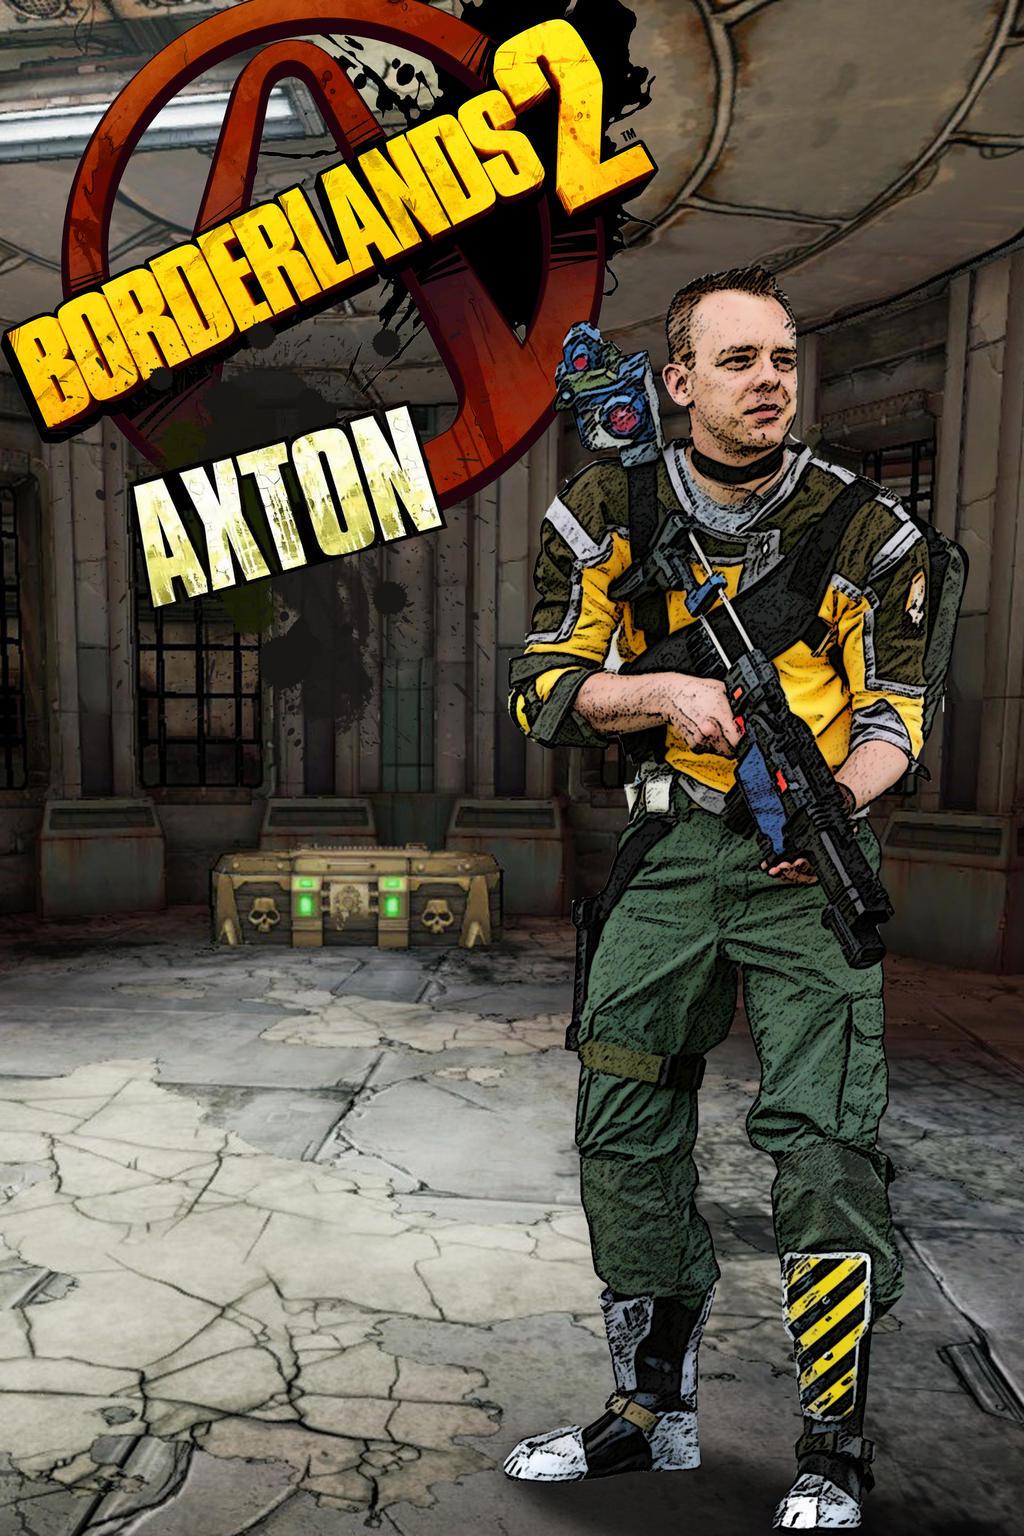 axton borderlands 2 cosplay sanctuary by ruun on deviantart